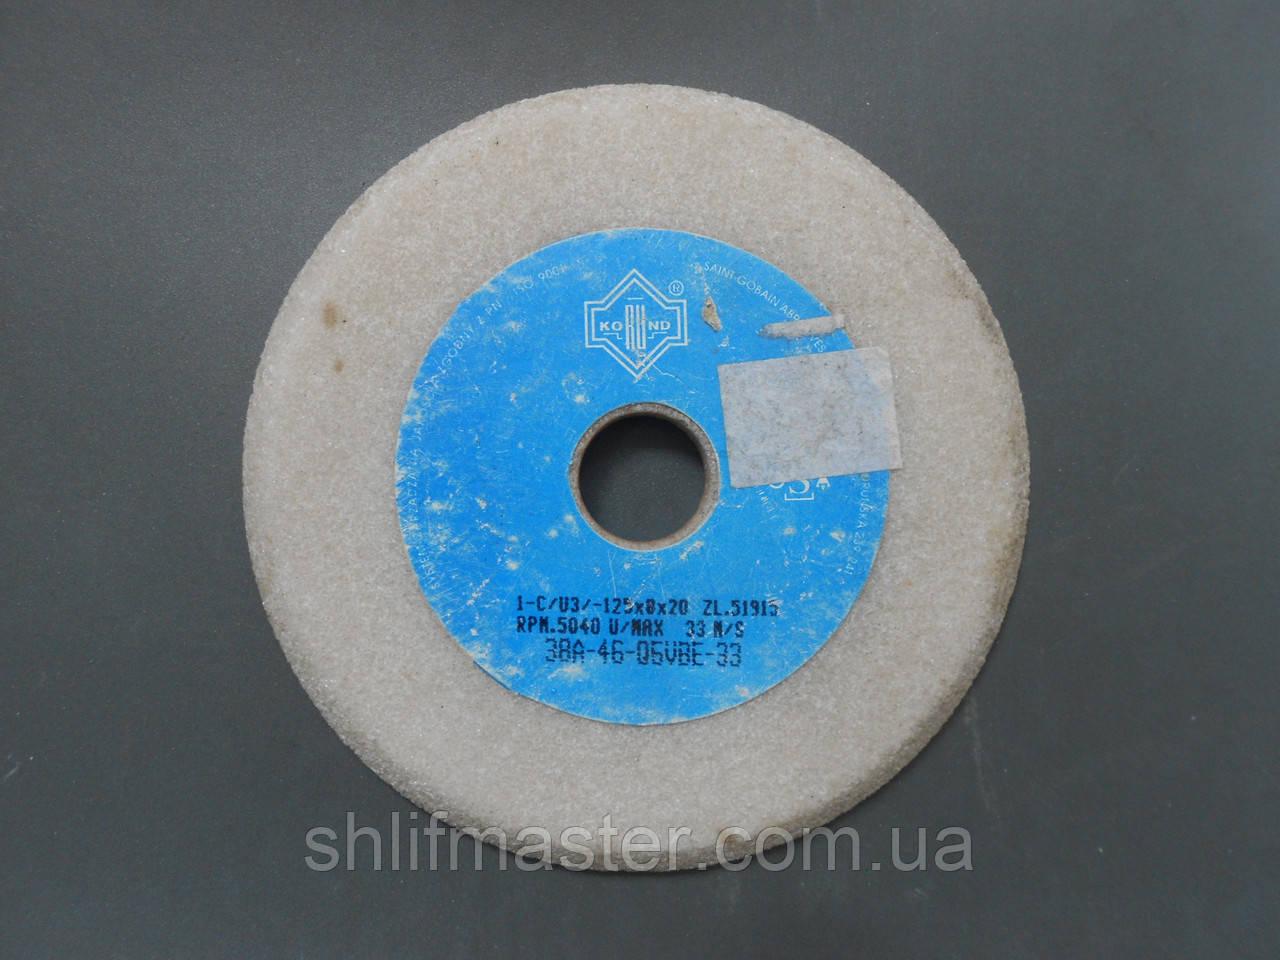 Круг для заточки пил 3П 38А 125х8х20 40Q SVBE-3